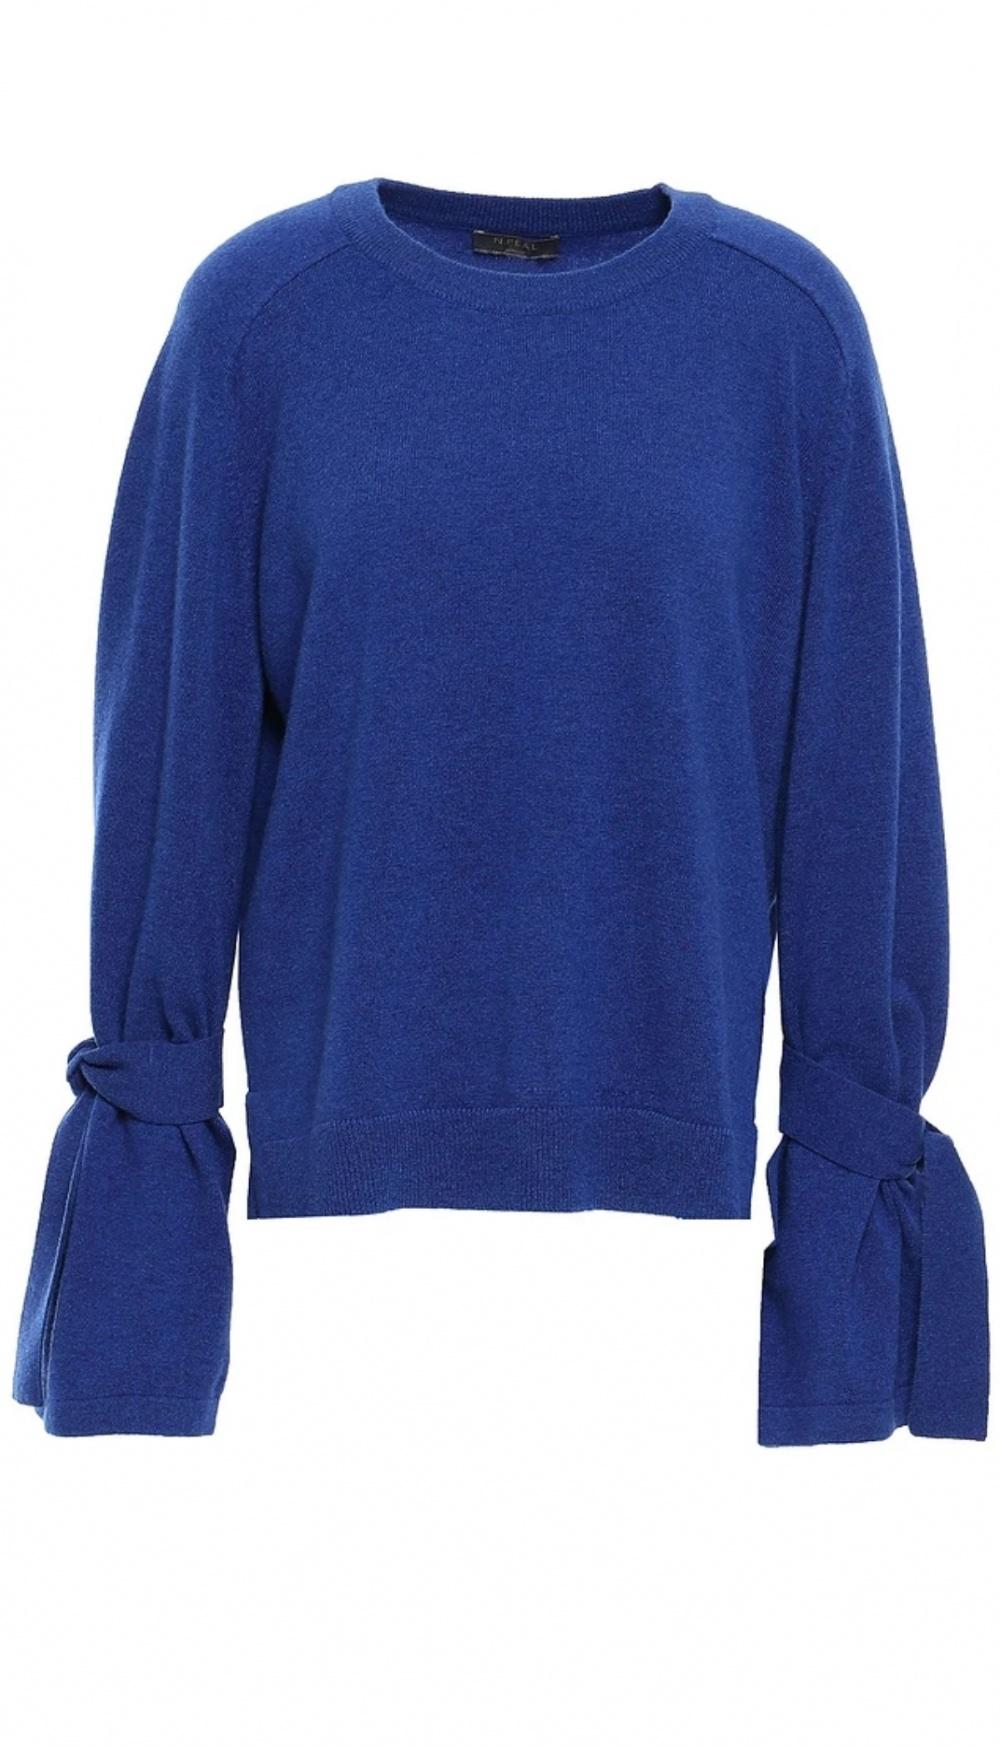 Кашемировый свитер N.Peal , размер S